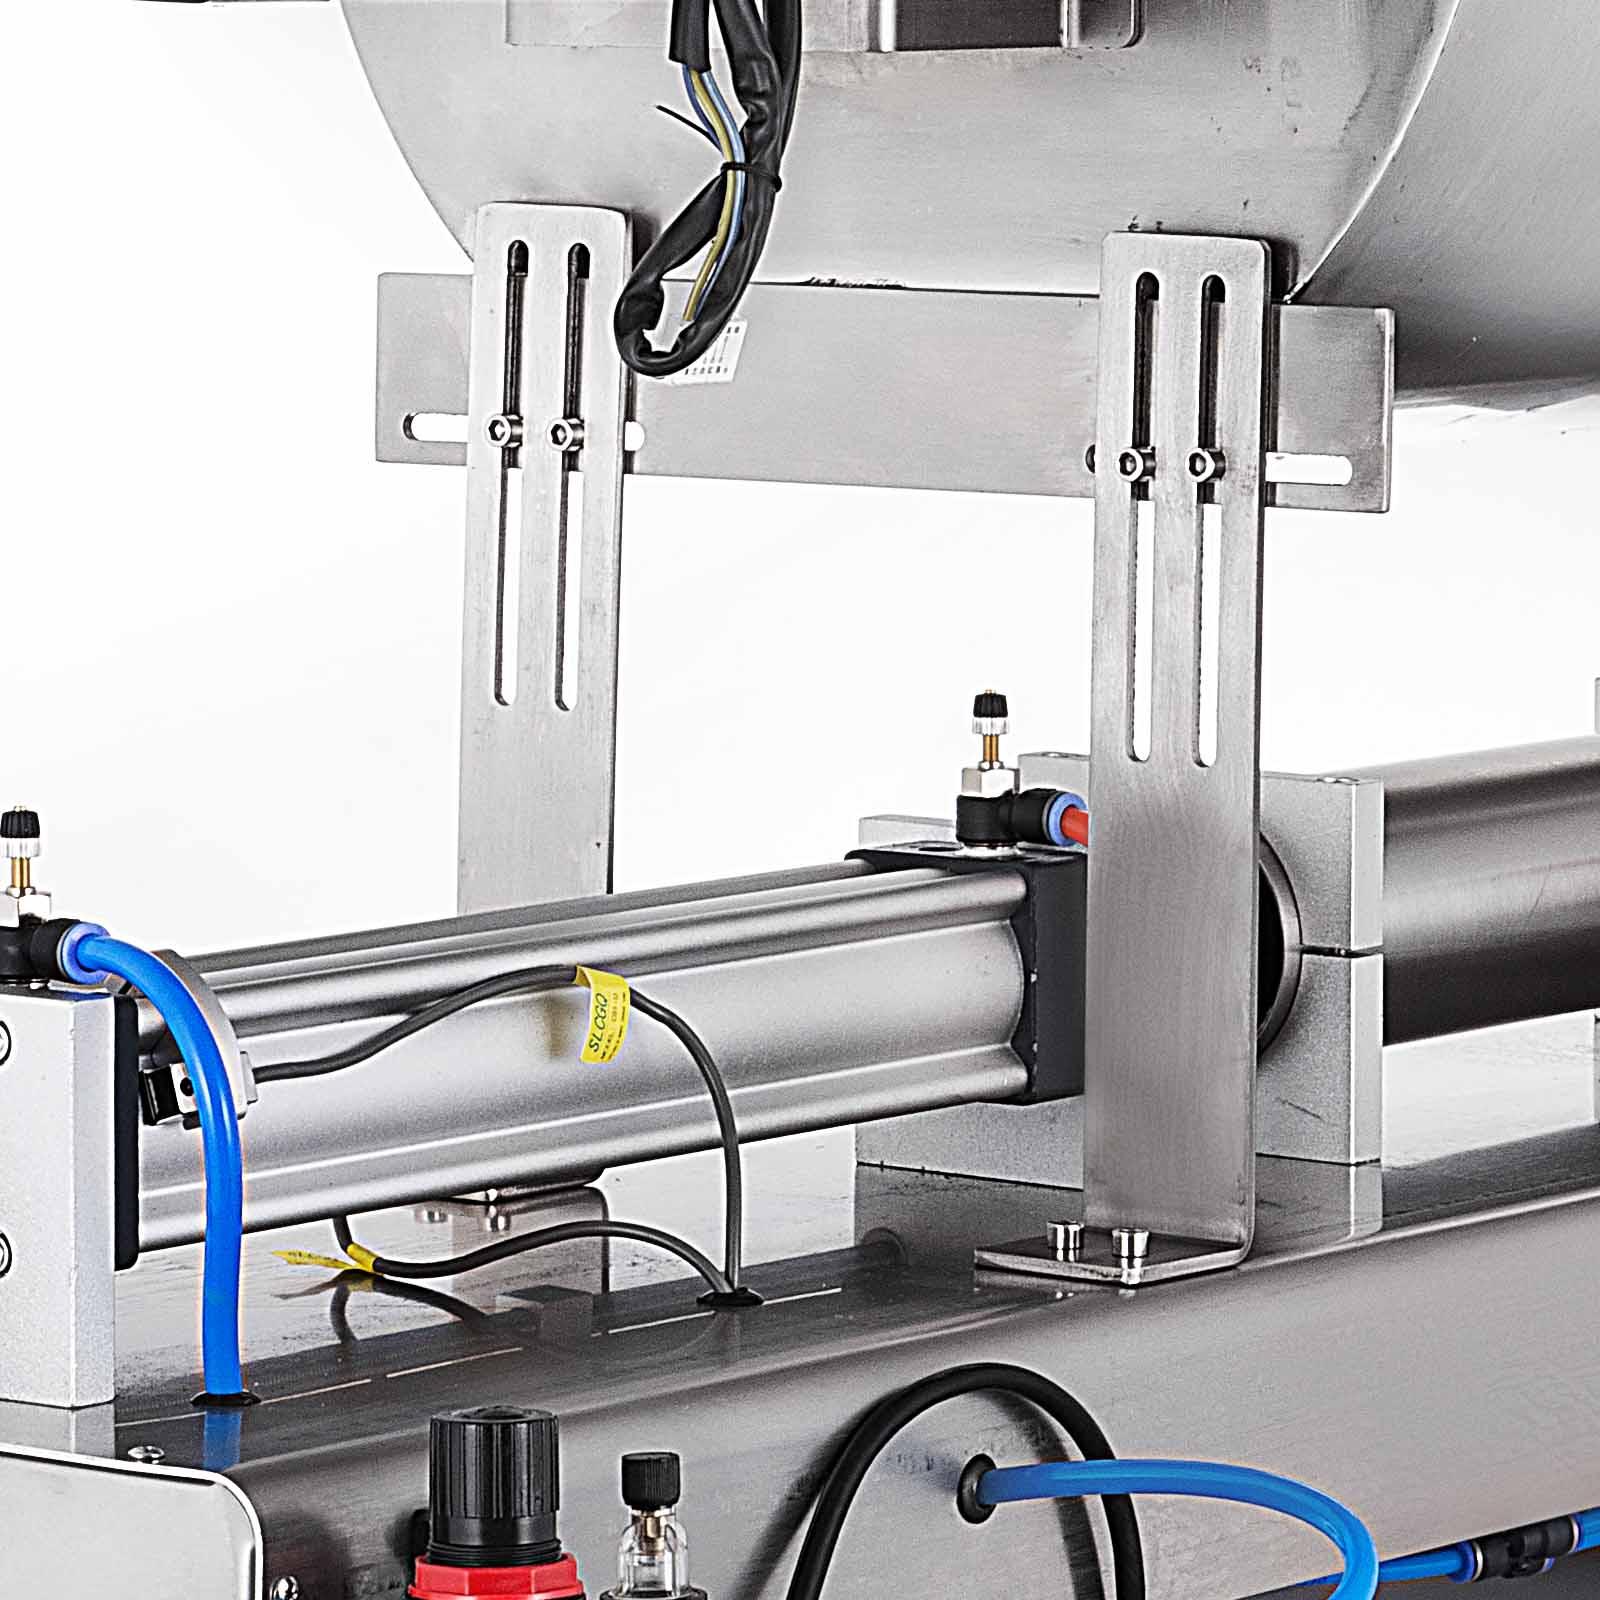 Liquid-Filling-Machine-Filler-Remplissage-2-3500ML-50-500ML-INDUSTRY-SUPPLY miniature 93